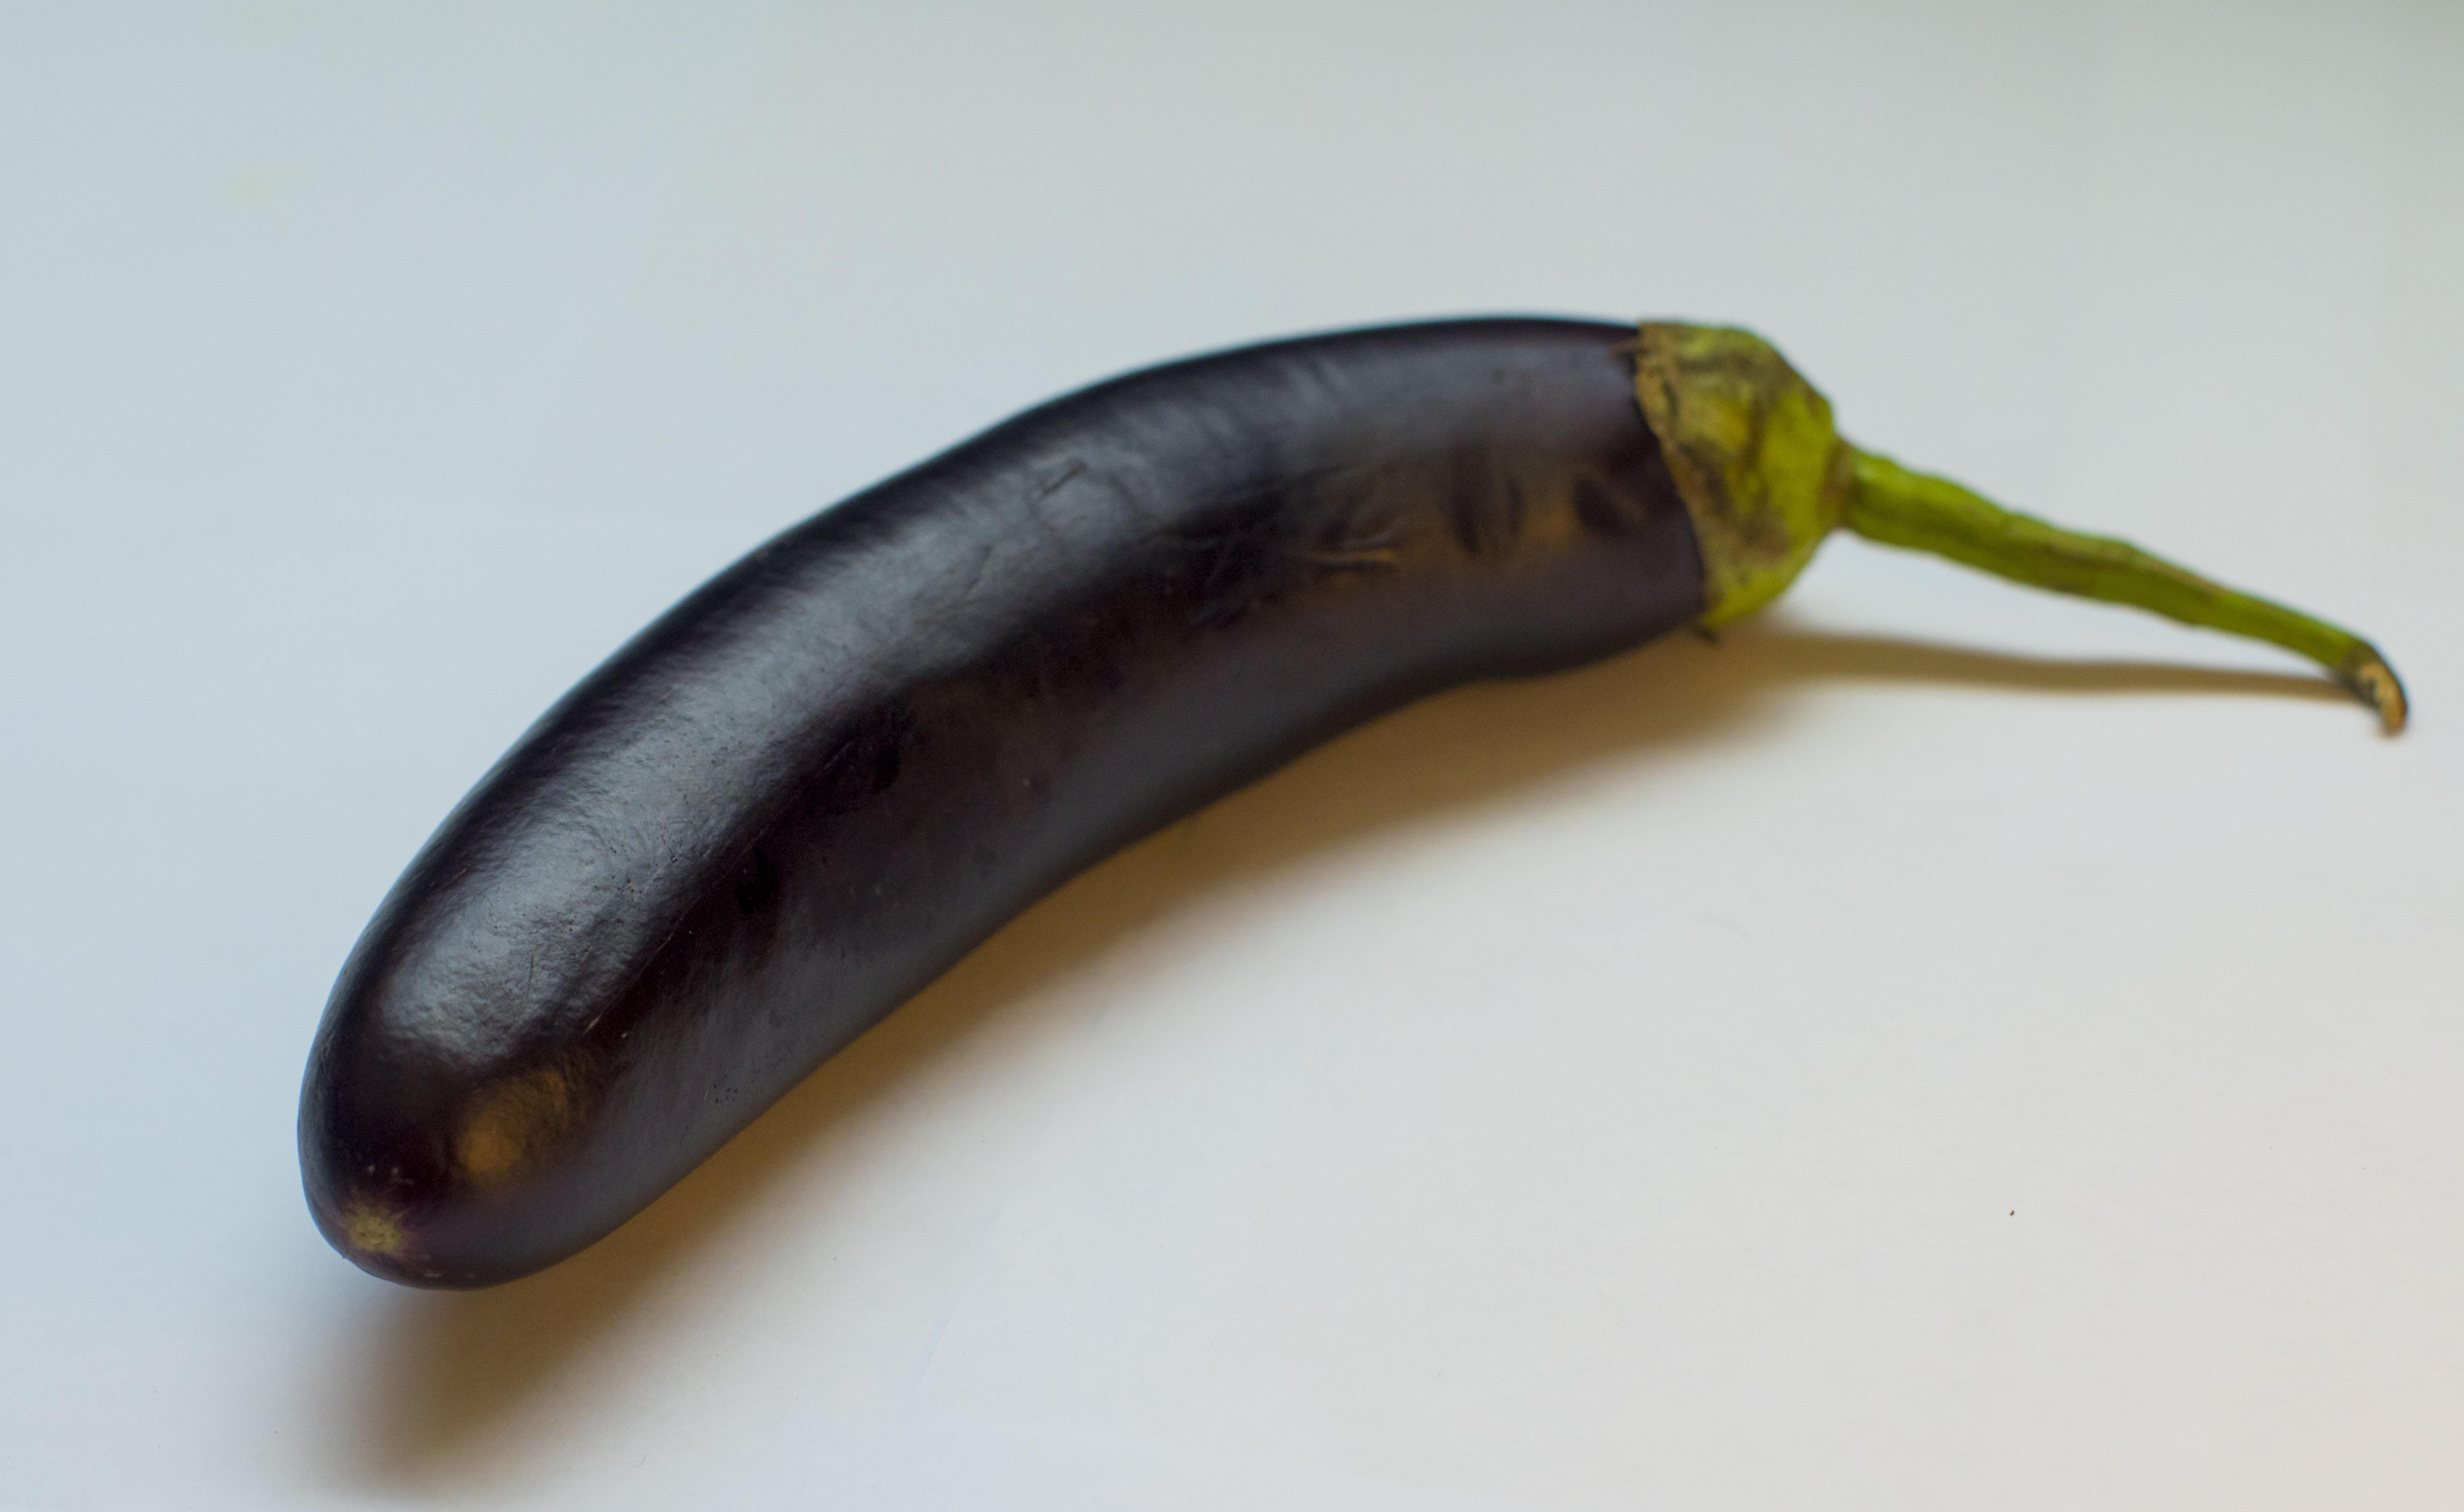 purple eggplant on white surface